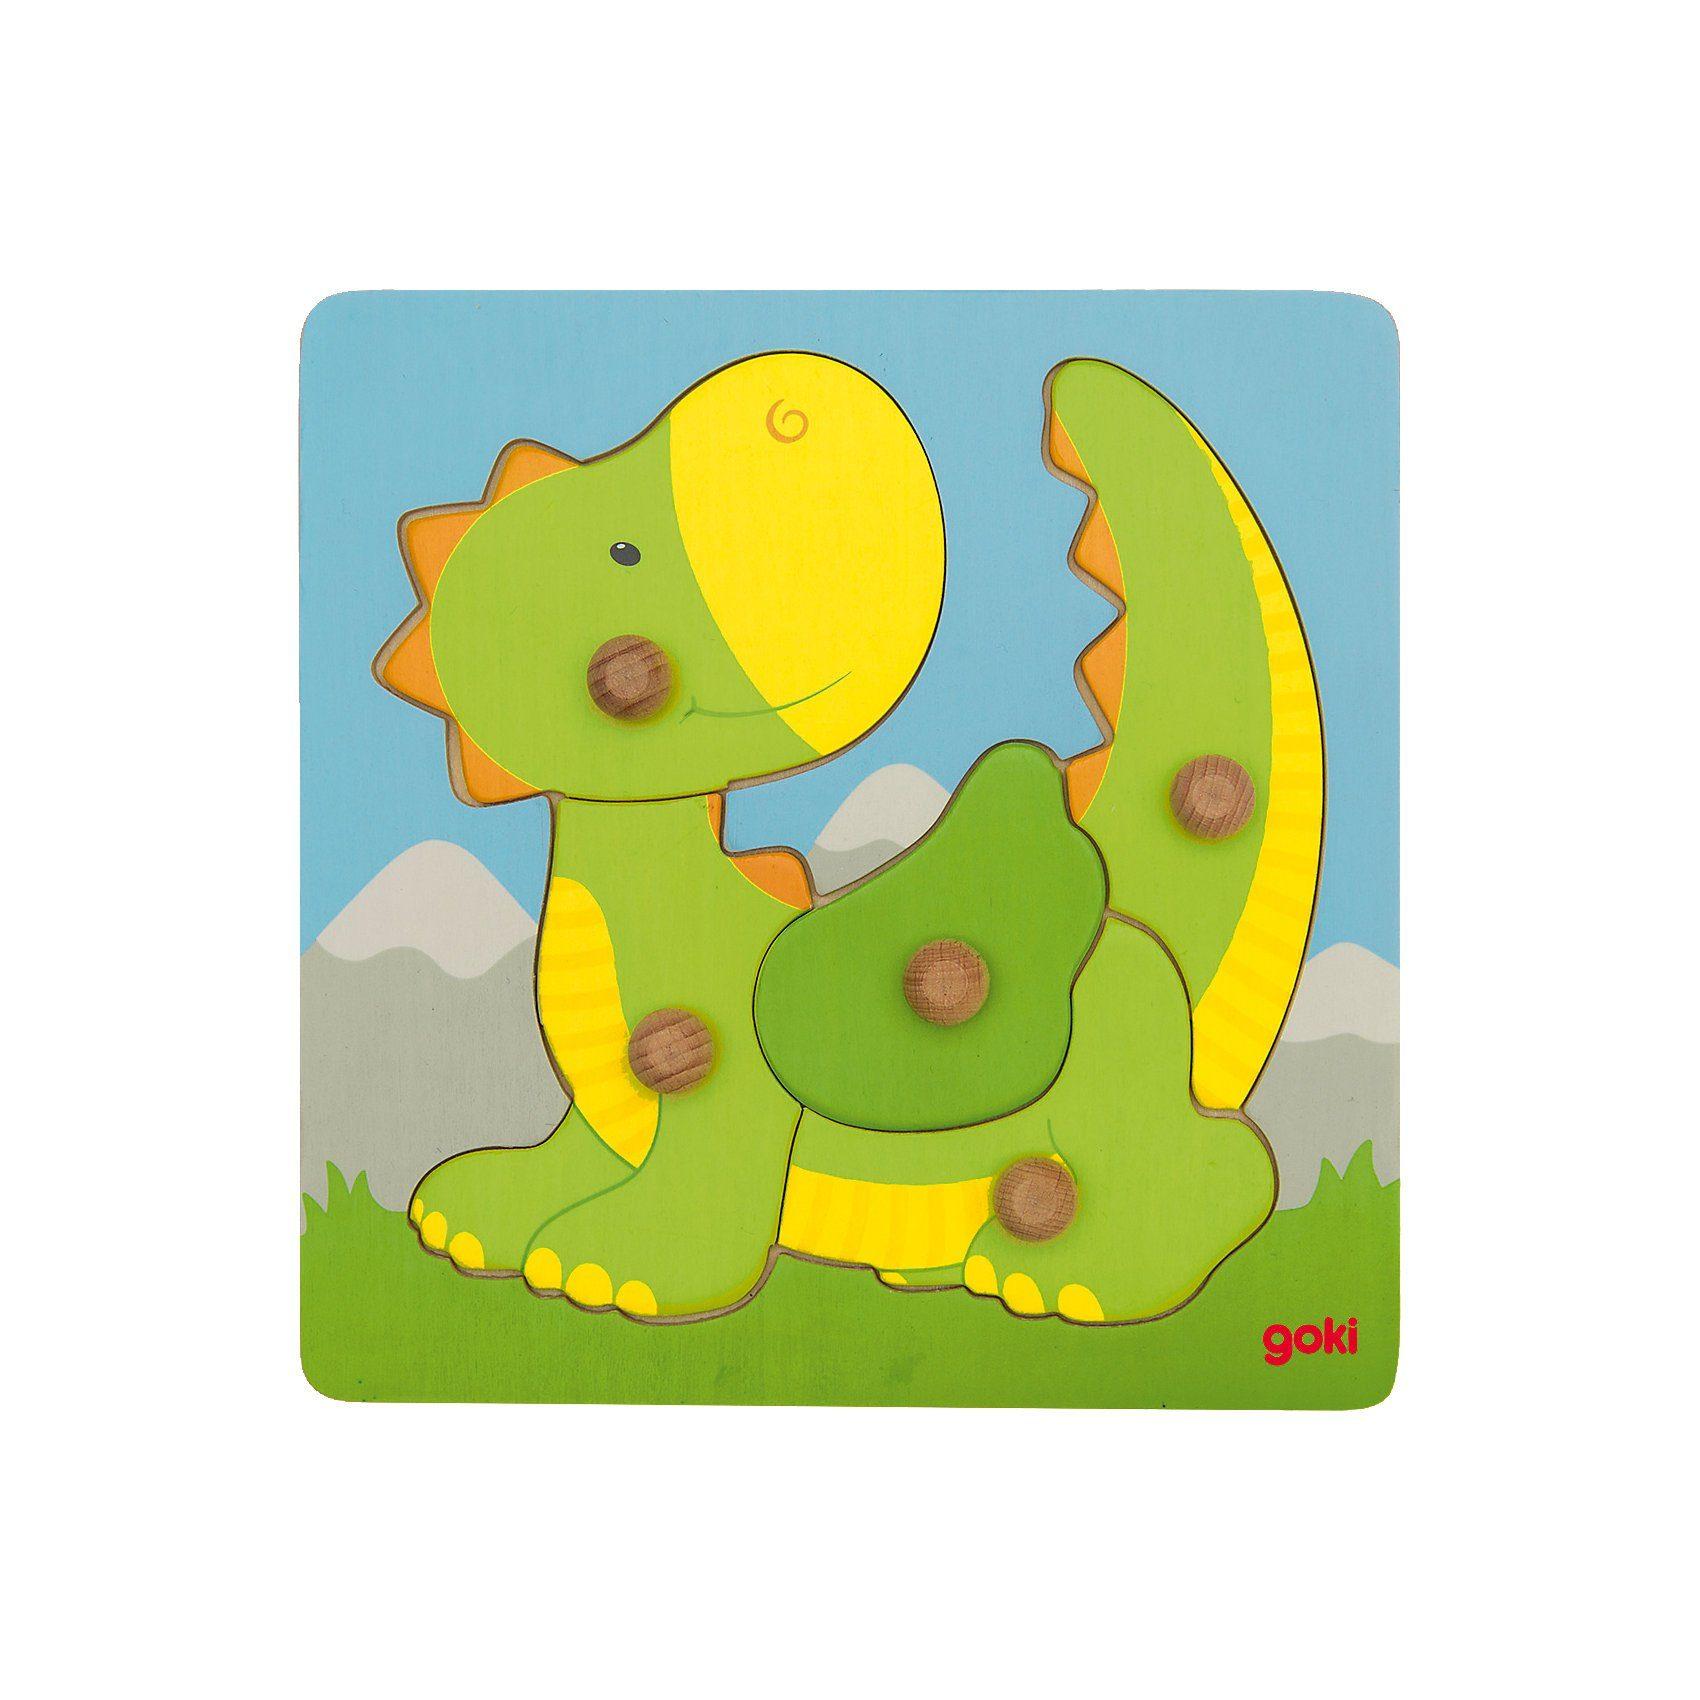 goki Steckpuzzle Drache